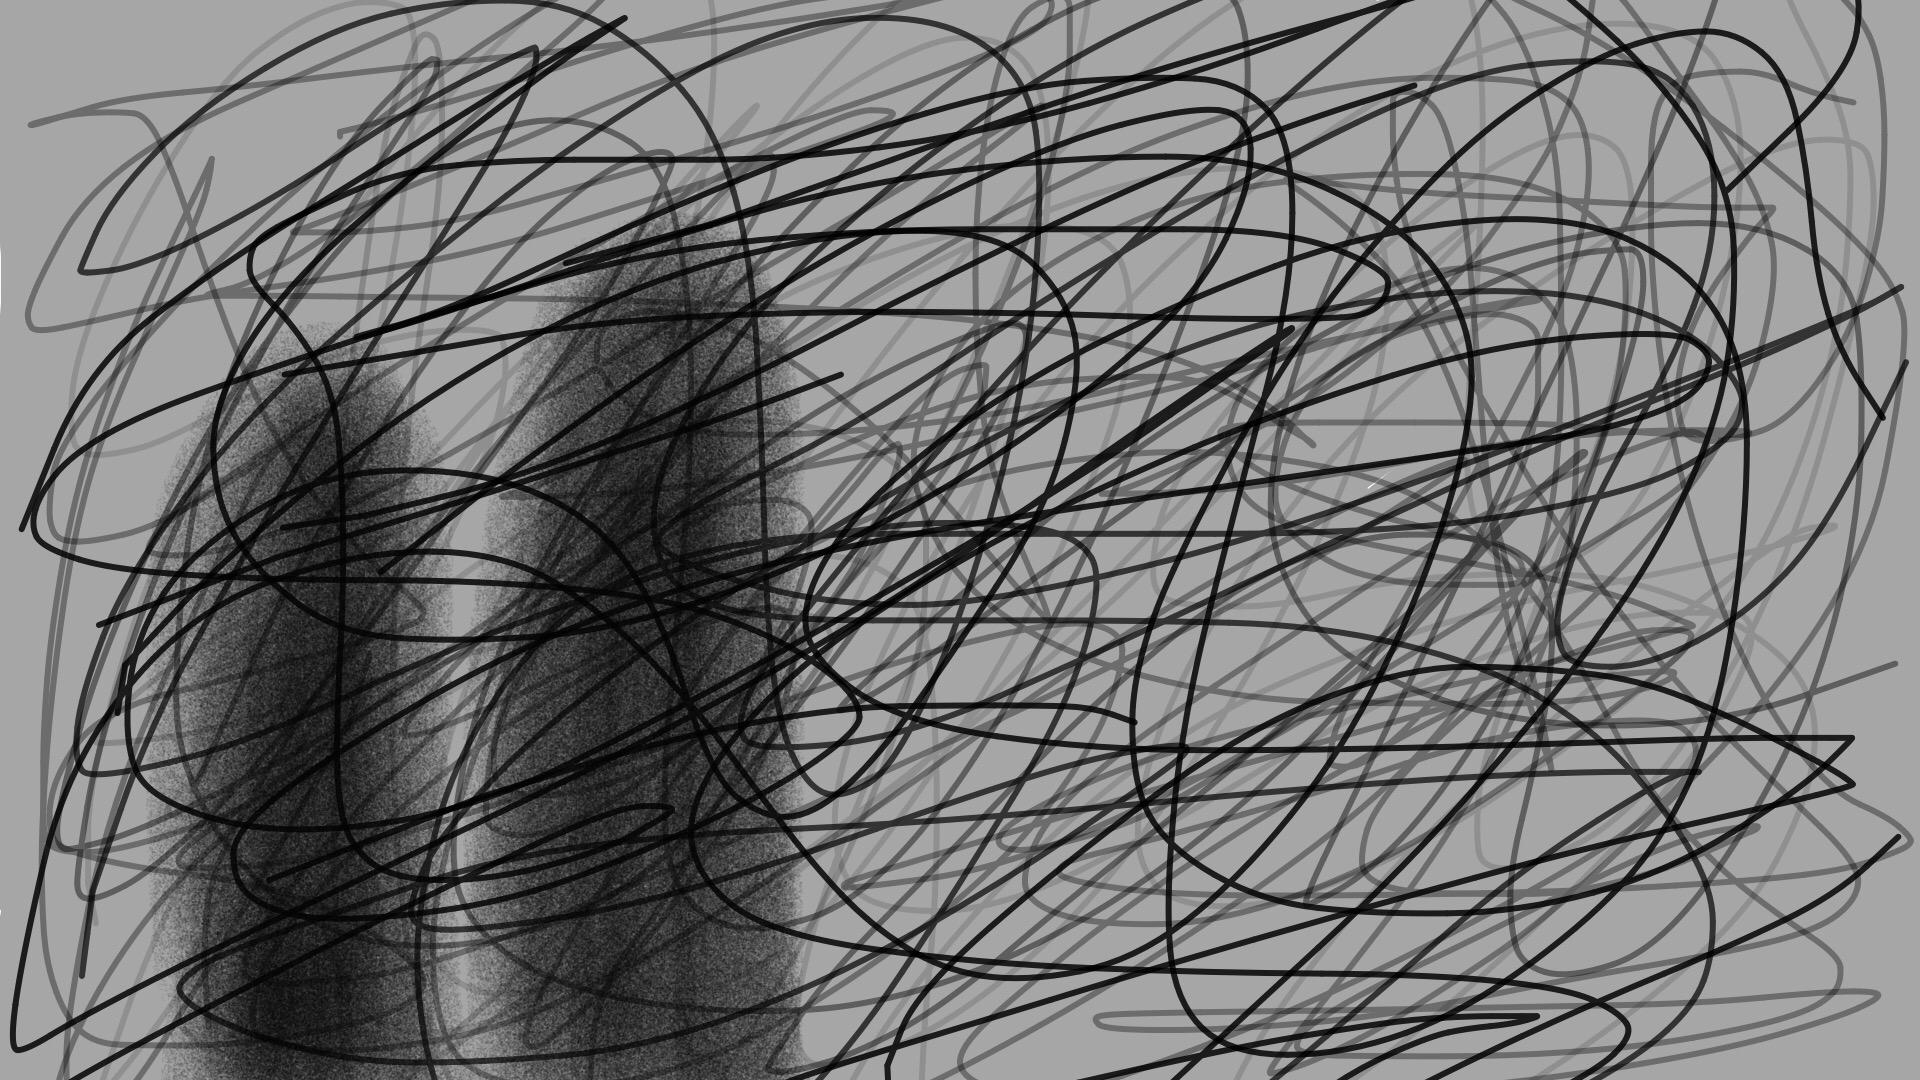 Sleep paralysis: the monster that haunts my nights – HS Insider